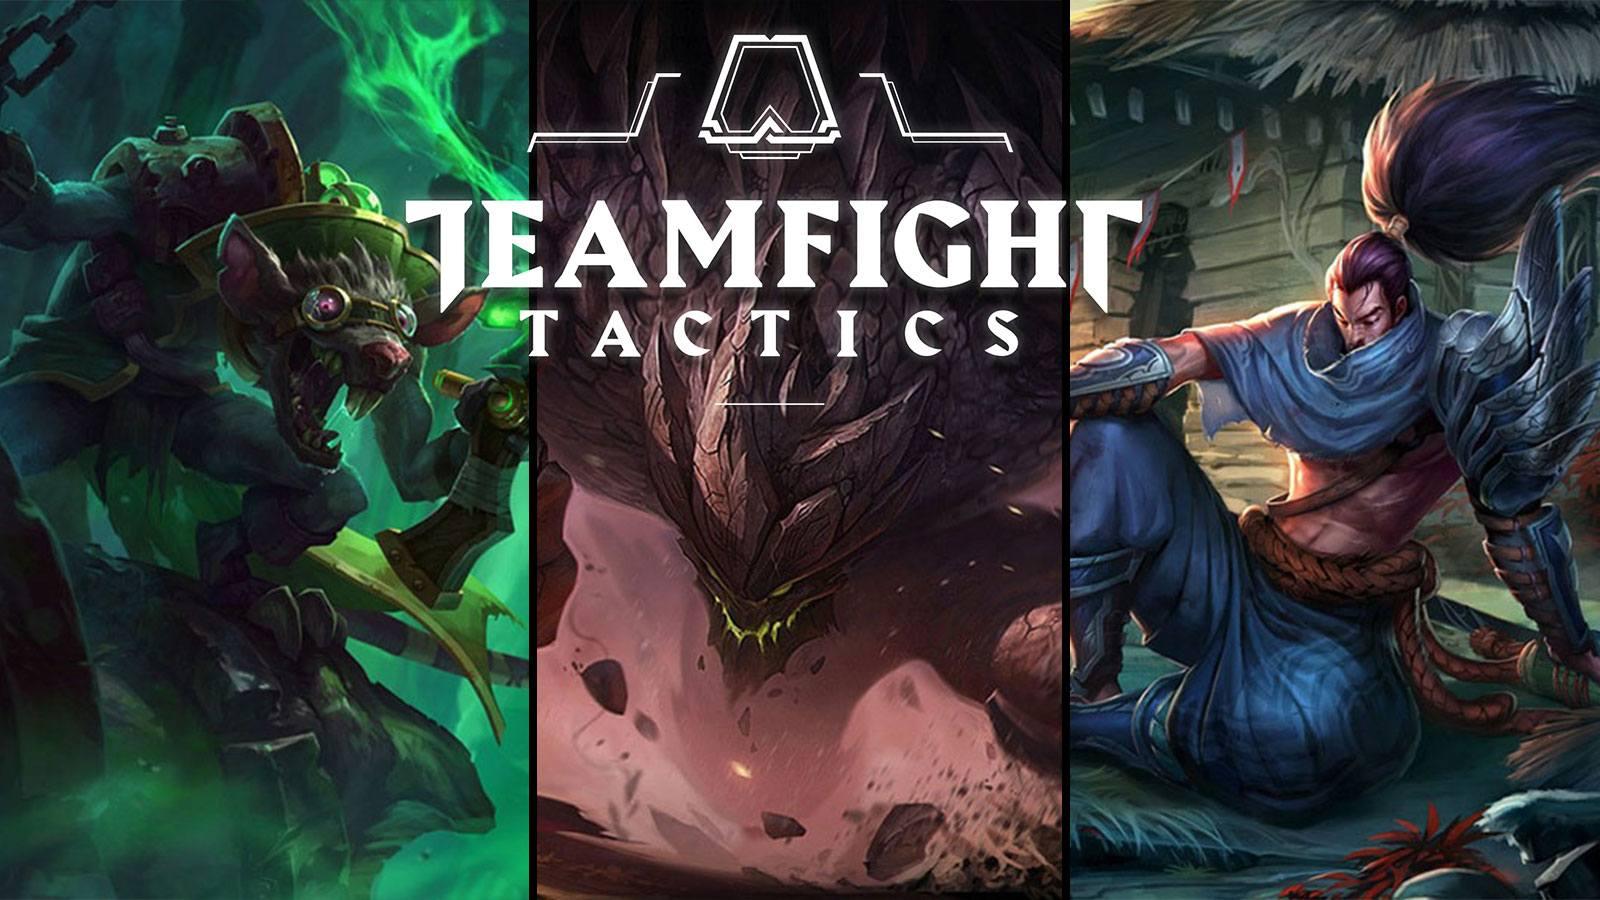 Twitch, Malphite et Yasuo dans Teamfight Tactics